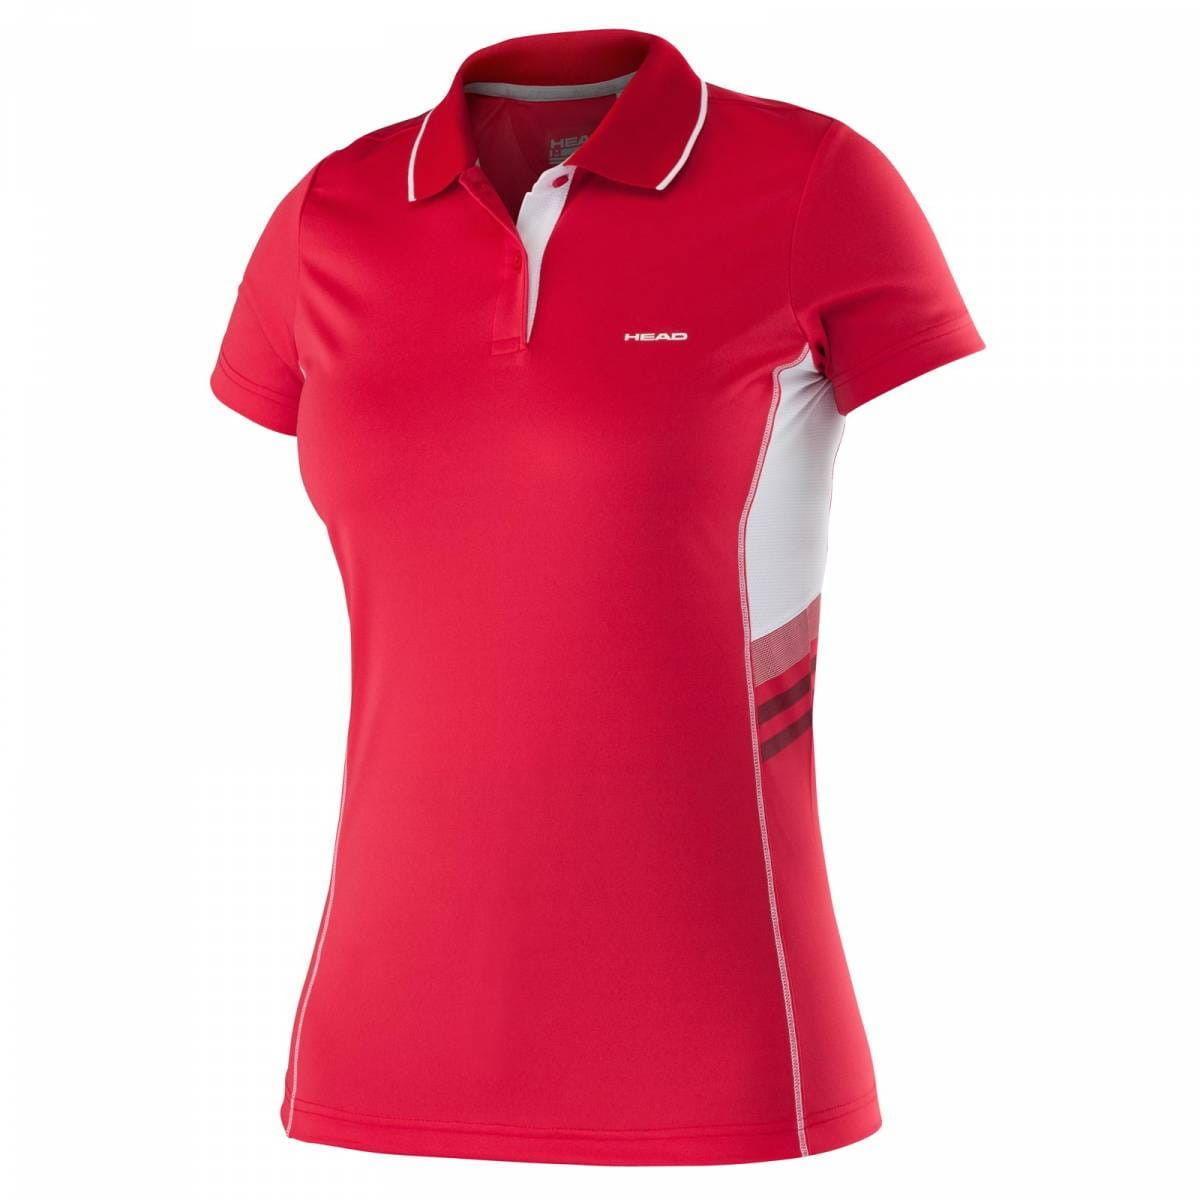 Head Club W Polo Shirt Technical - red 814675-RD